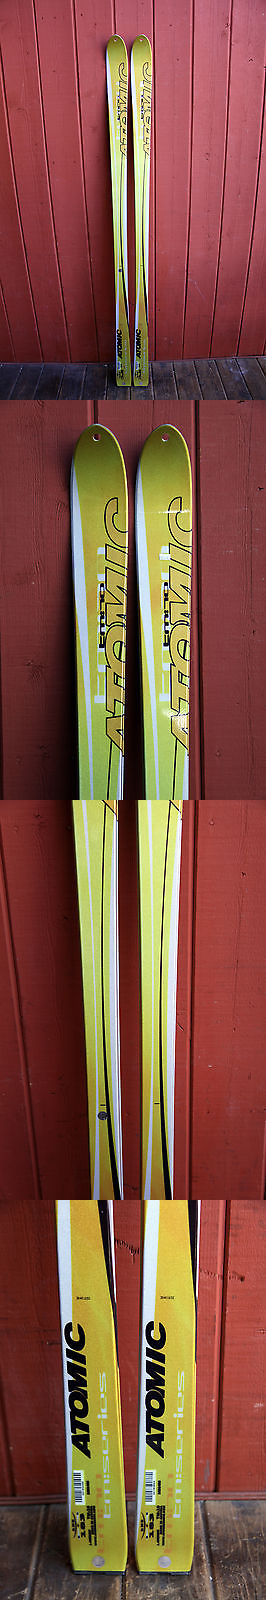 Telemarking 62214: Atomic Tm:10 Telemark Skis 183 Cm. Brand New! Telemarking Tm10 BUY IT NOW ONLY: $135.0